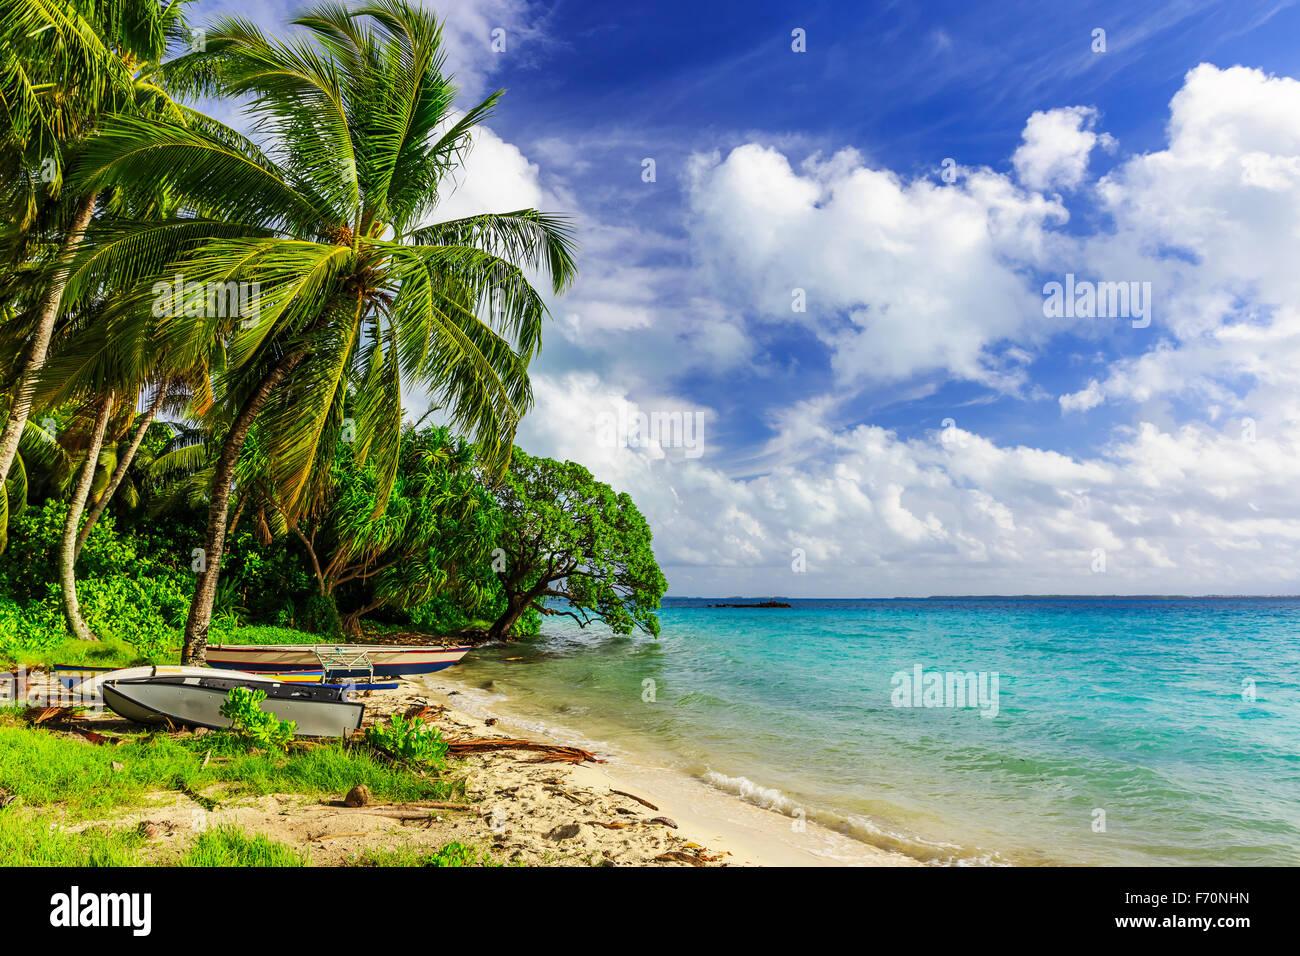 Tabuaeran Beach en la isla Fanning, República de Kiribati Imagen De Stock